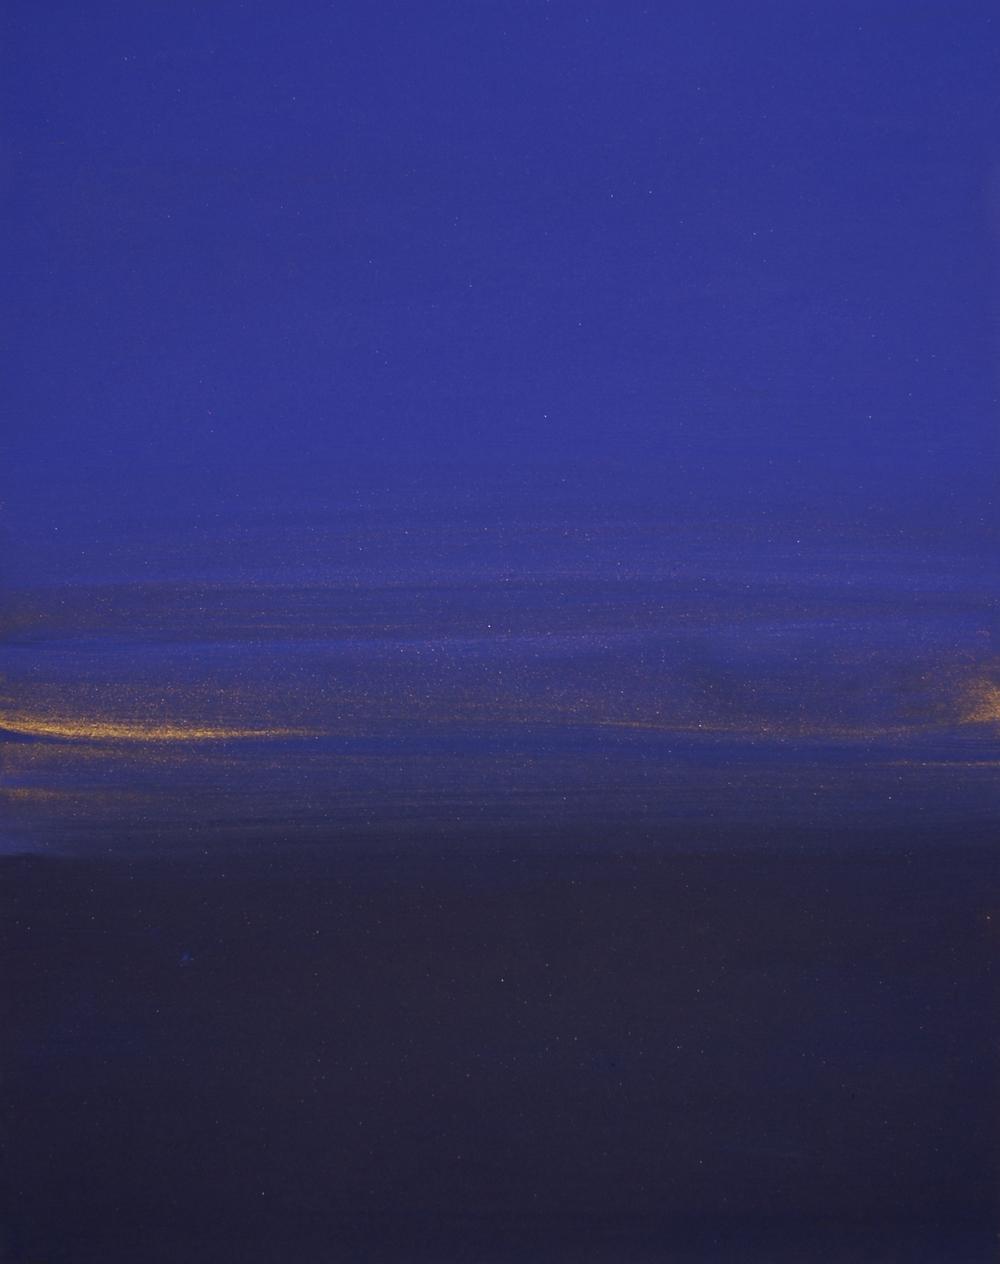 serendib taprobhane II pigments with egg tempera on paper 45 x 35,5 cm 2009 sri lanka